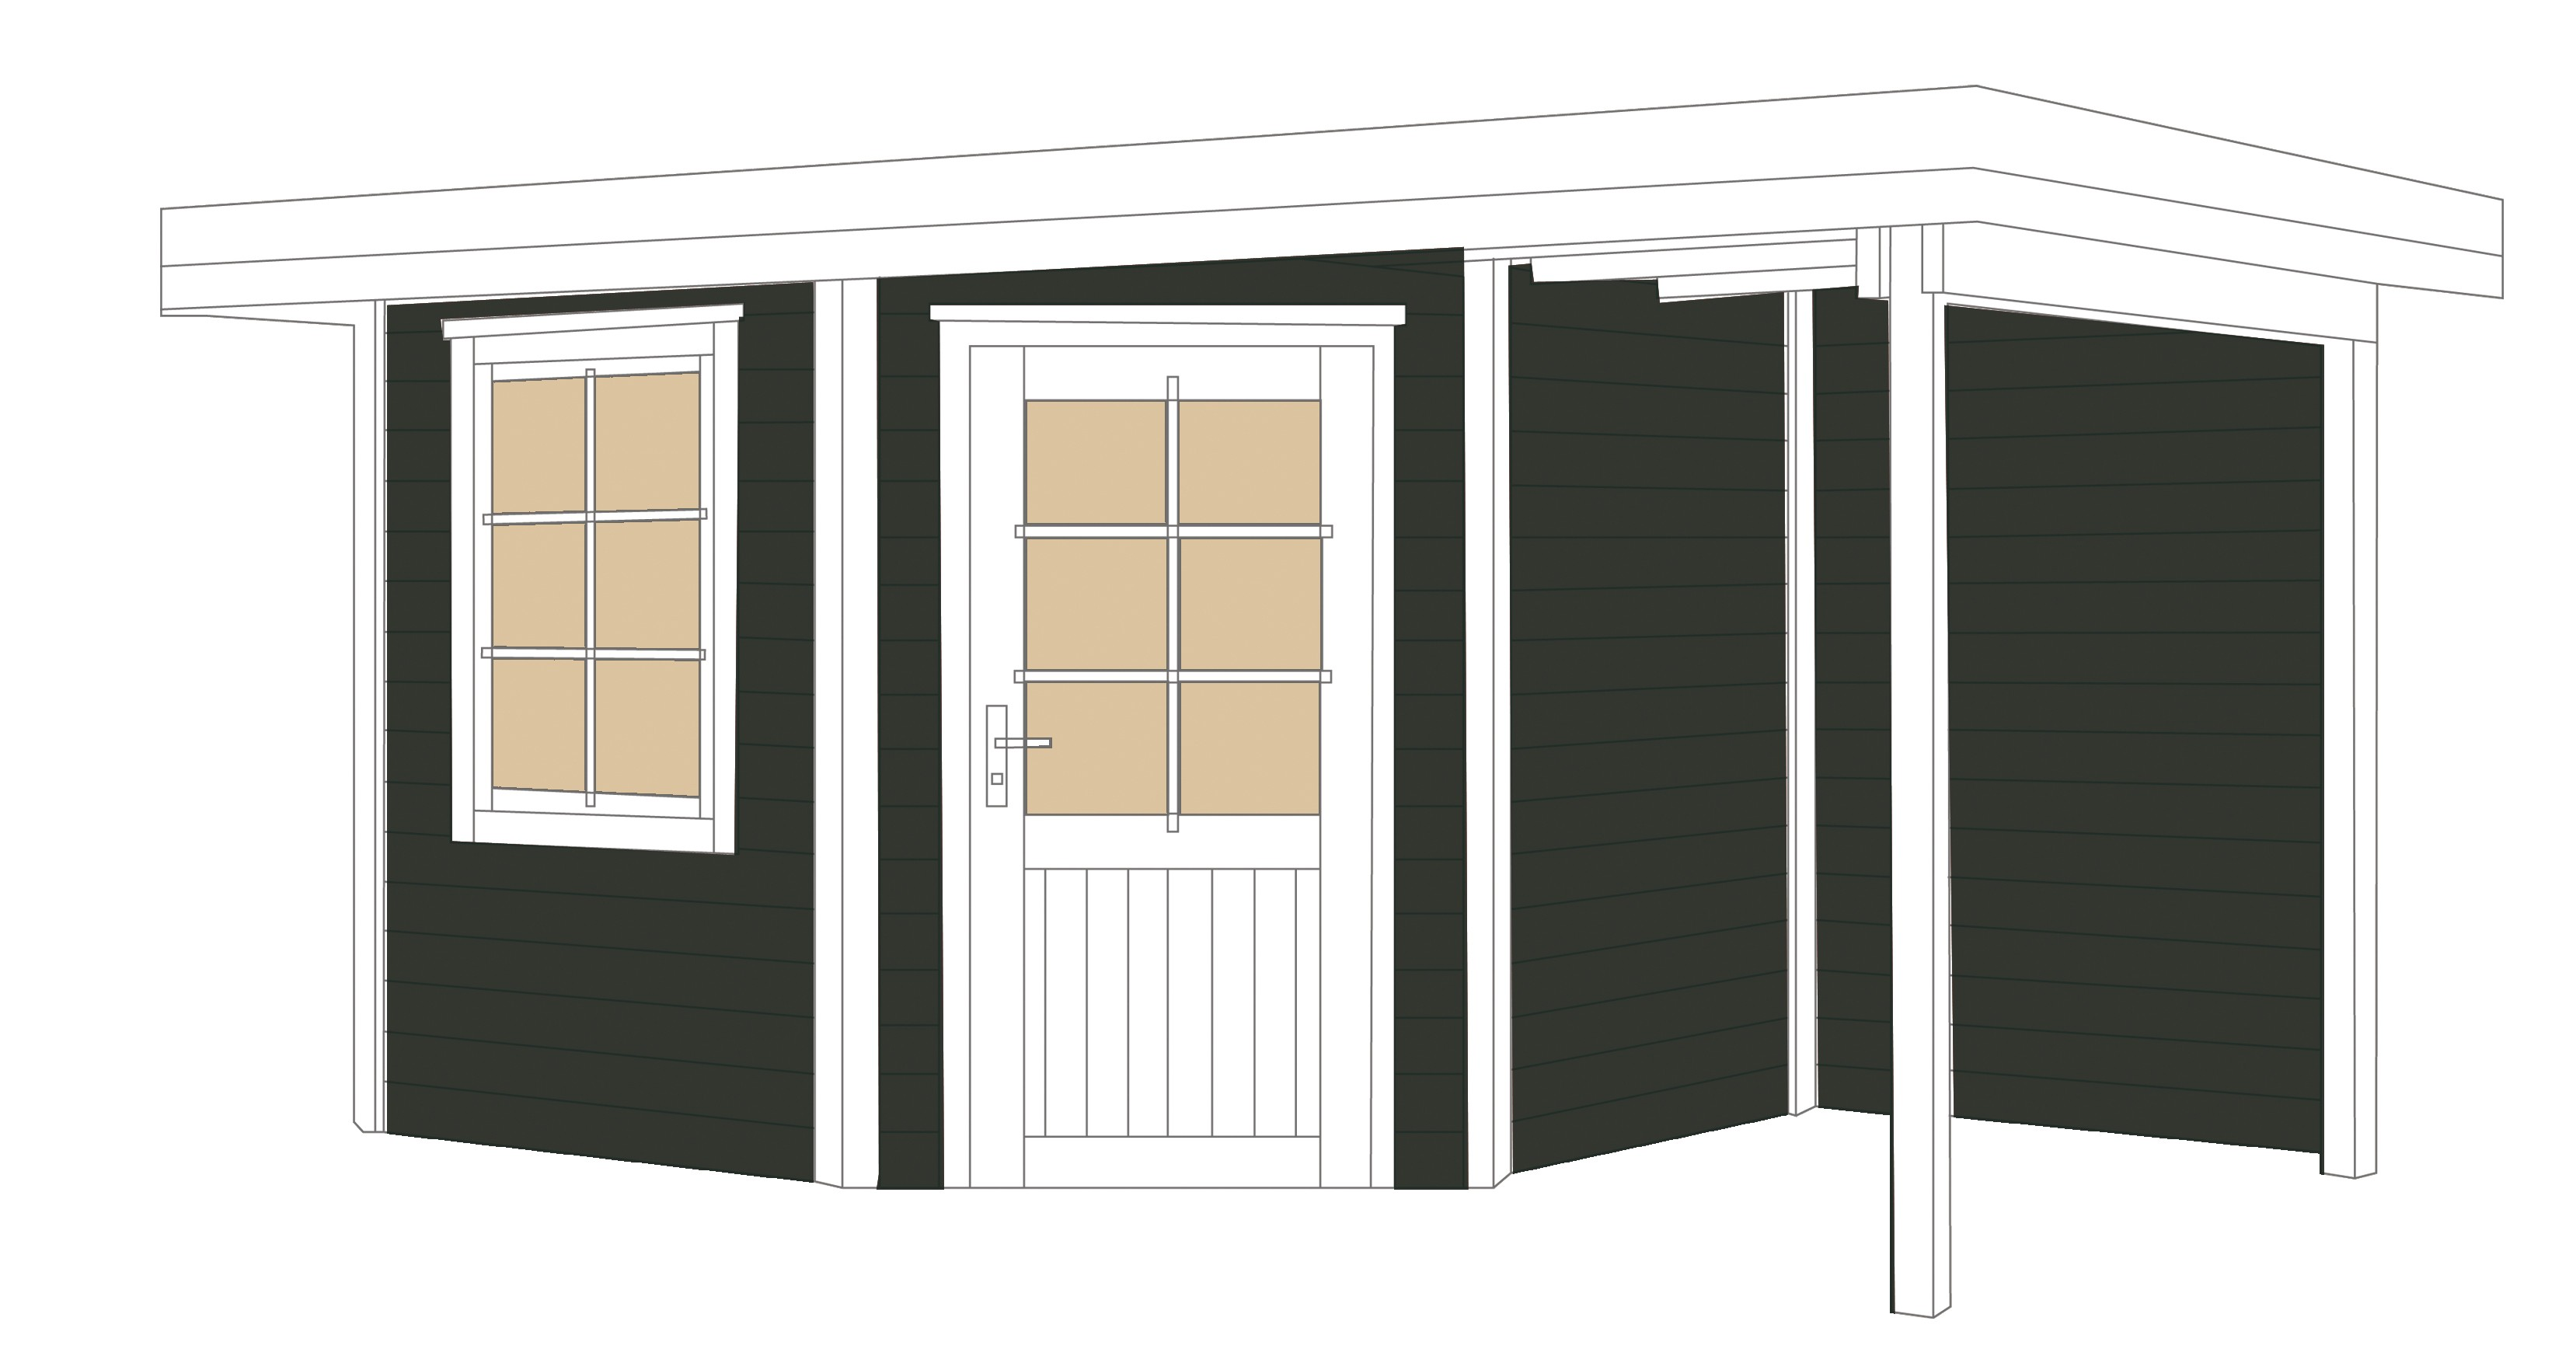 weka gartenhaus 28mm designhaus 213a gr 1 anbau anthrazit 442x278cm bei. Black Bedroom Furniture Sets. Home Design Ideas